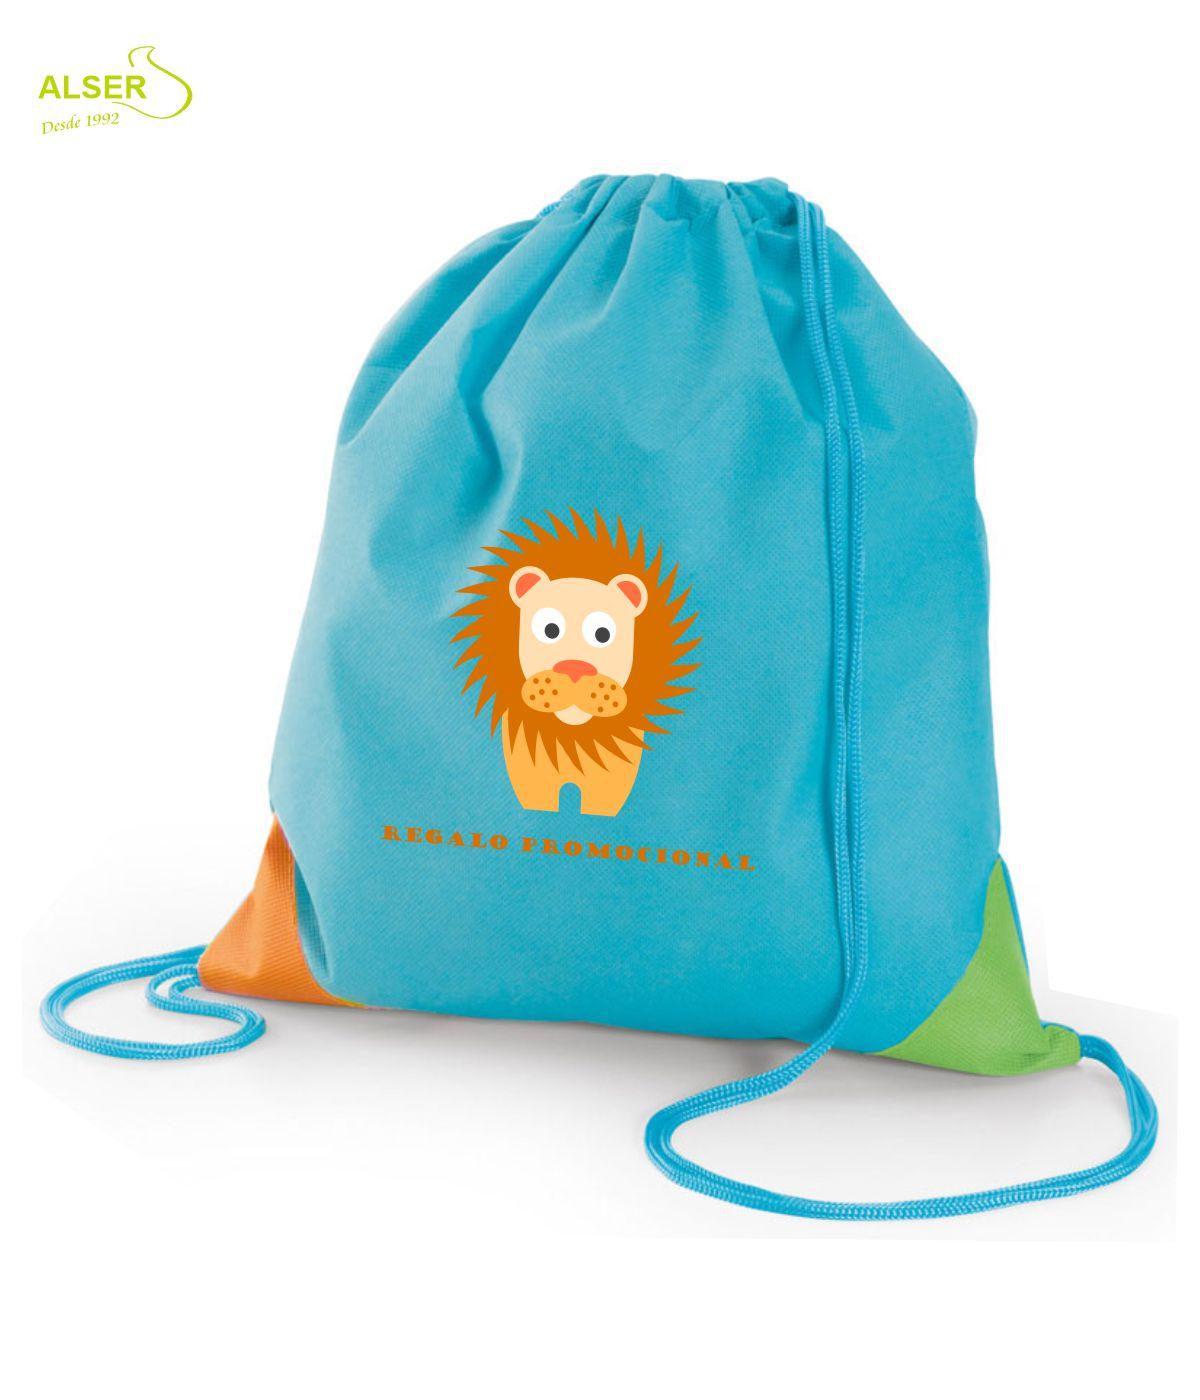 Mochila saco infantil para publicidad. Azul